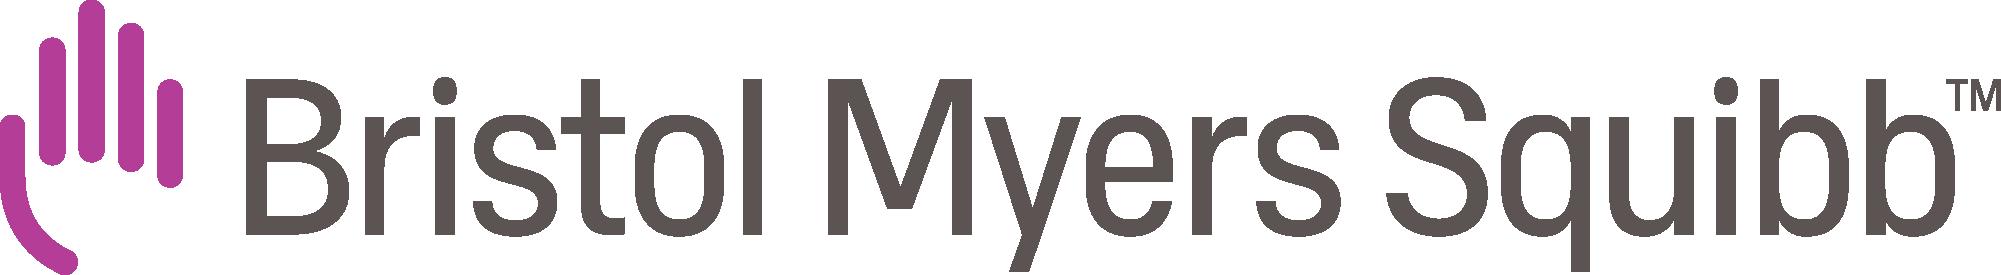 Bristol Myers Squibb: «Μαζί για τους ασθενείς: Σκοπός μας είναι η υγεία σας»